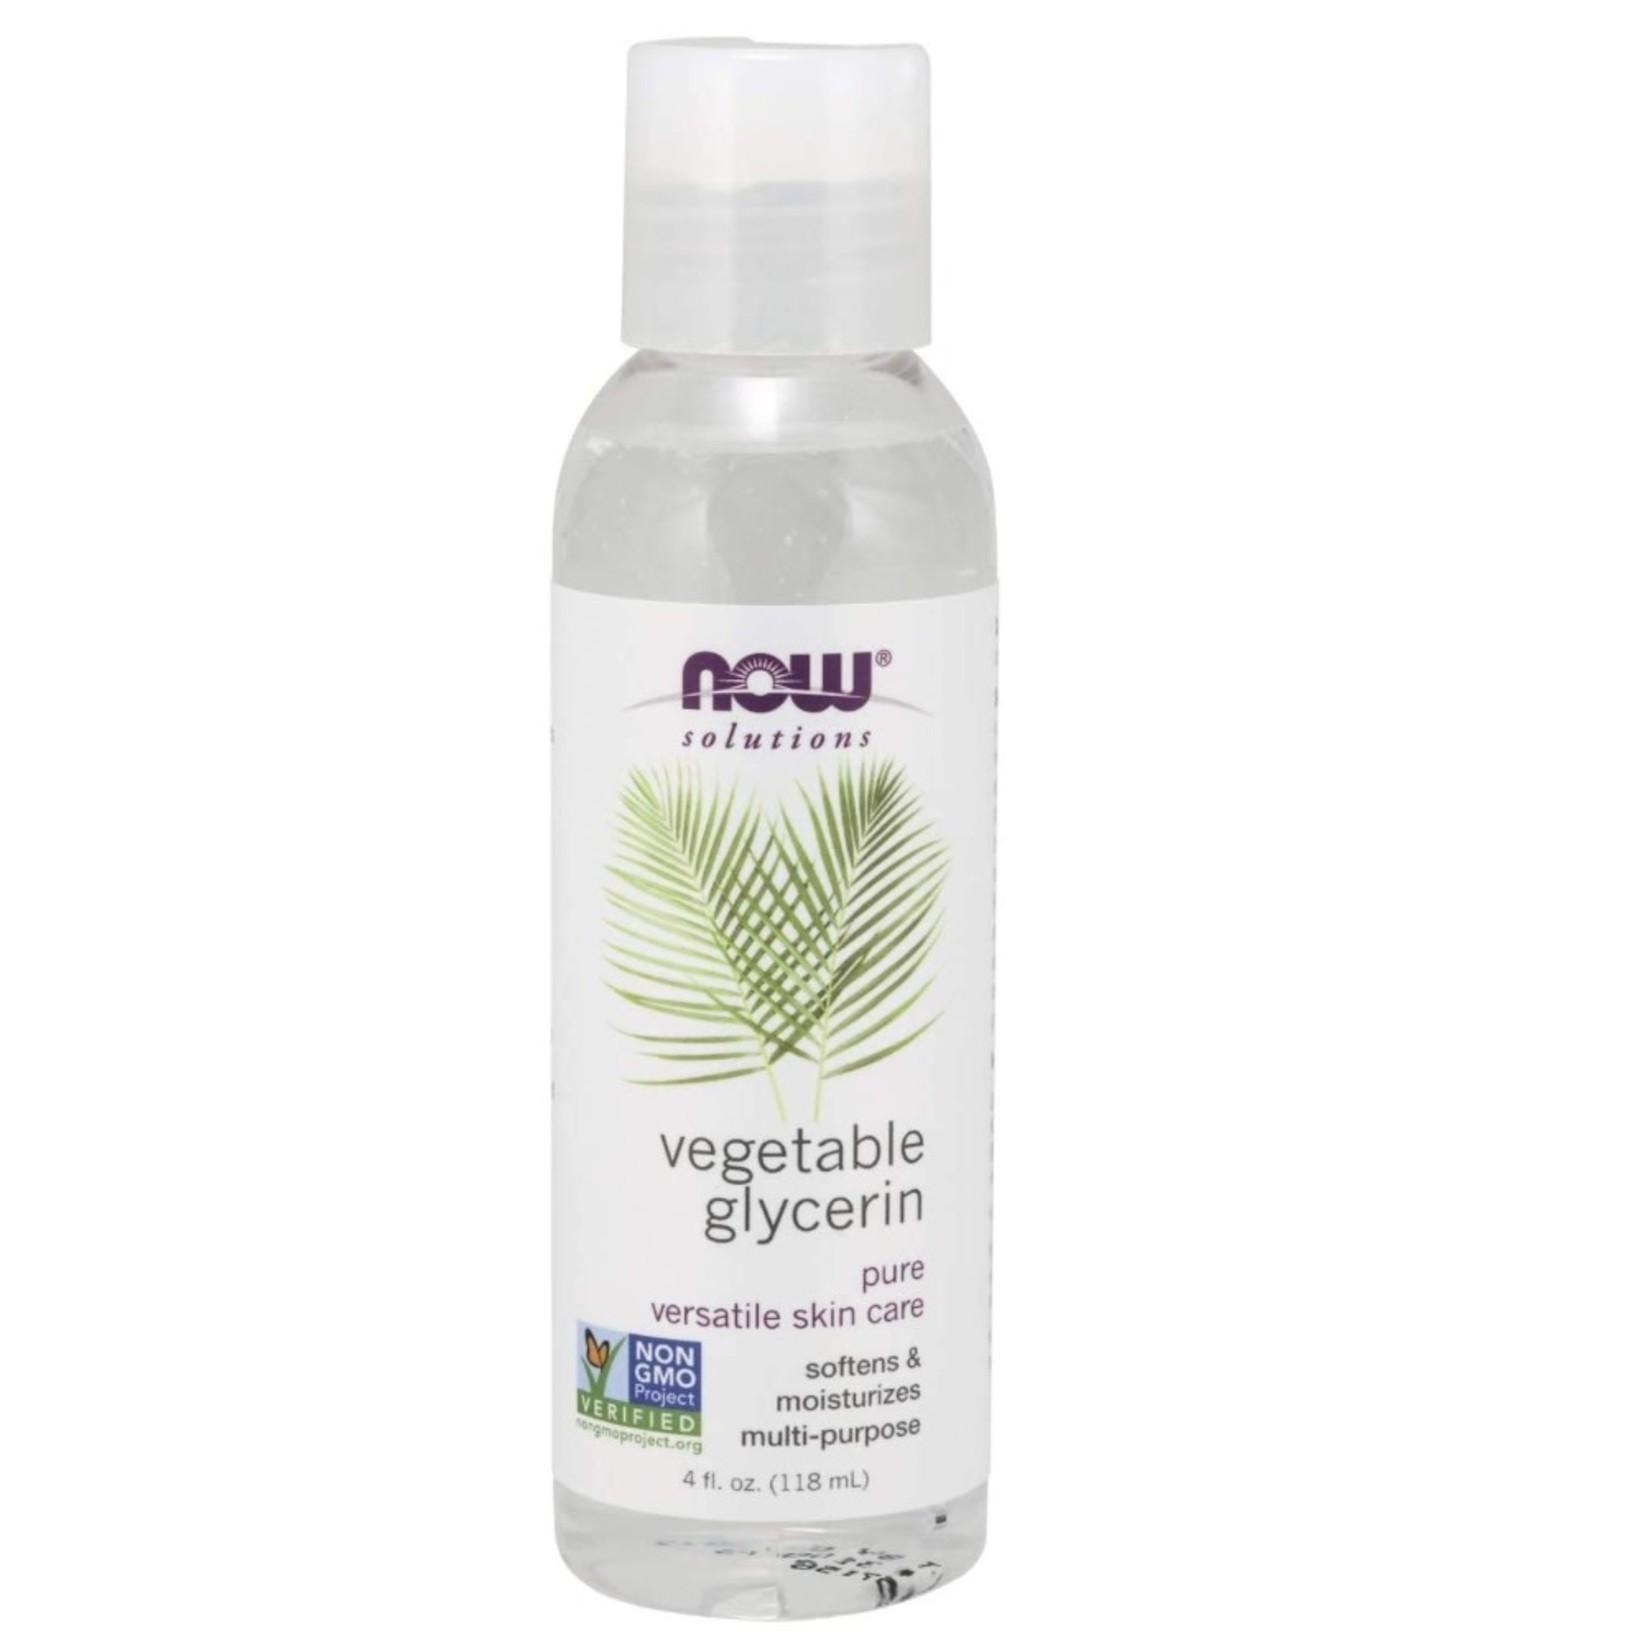 Now Now Vegetable Glycerin 118ml